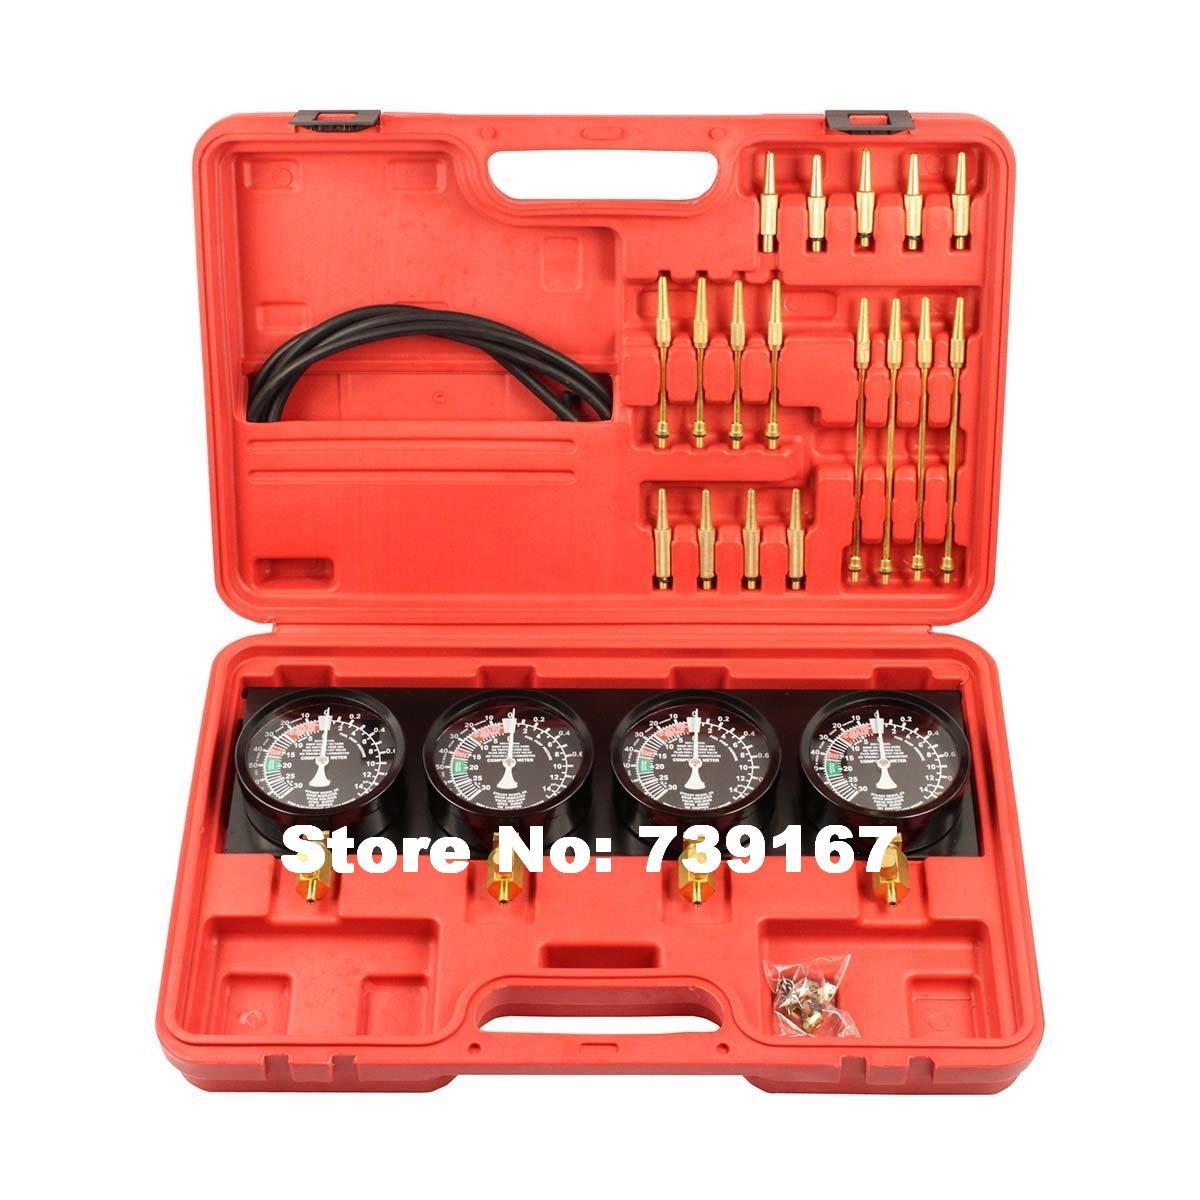 Fuel Vacuum Carburetor Synchronizer Diagnostic Test Adjust Setting Tool Set ST0101